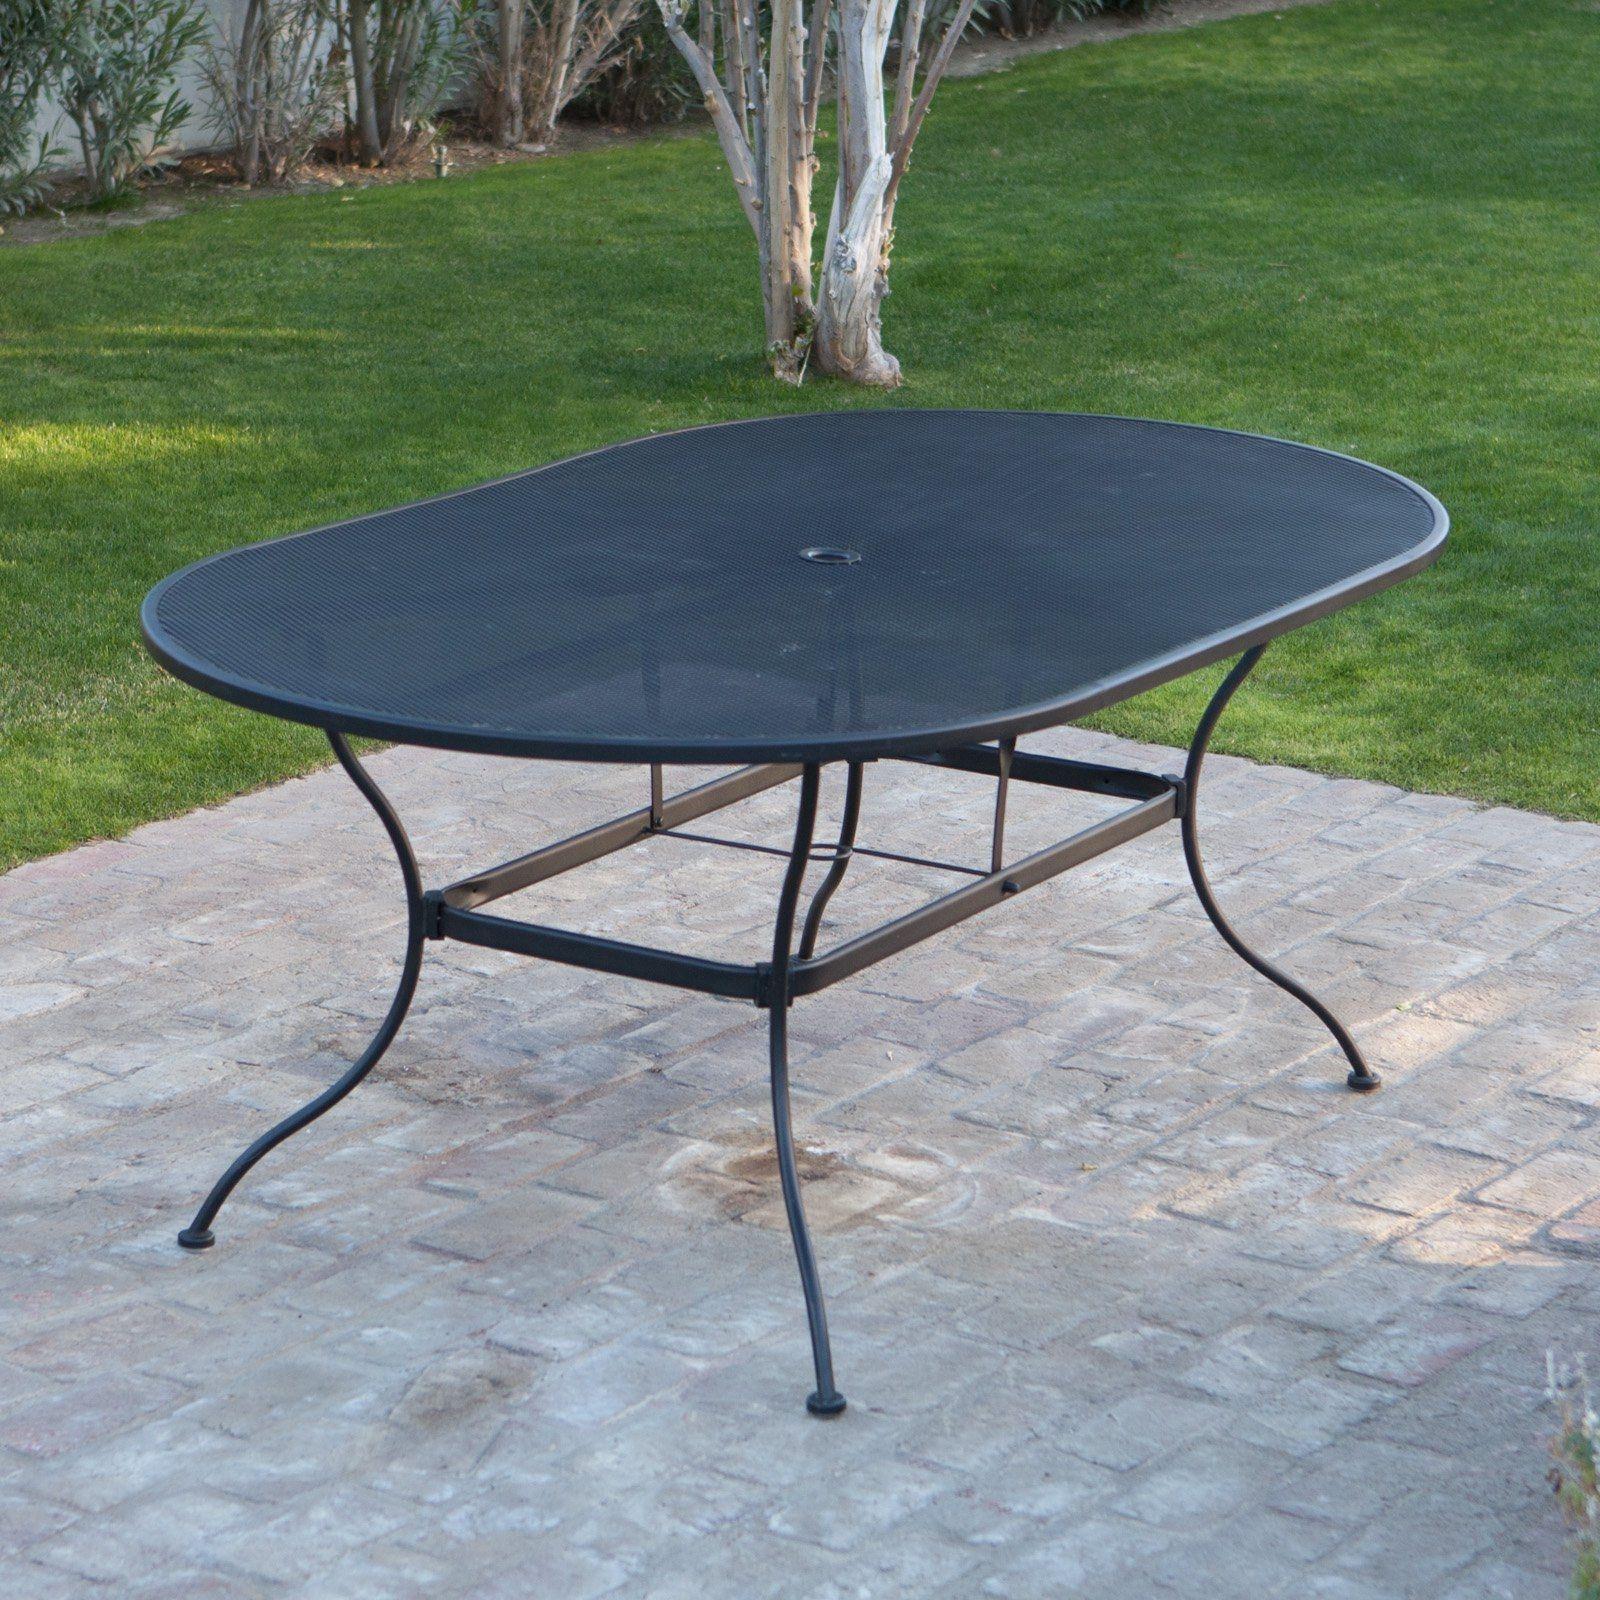 Woodard Wrought Iron Patio Coffee Table